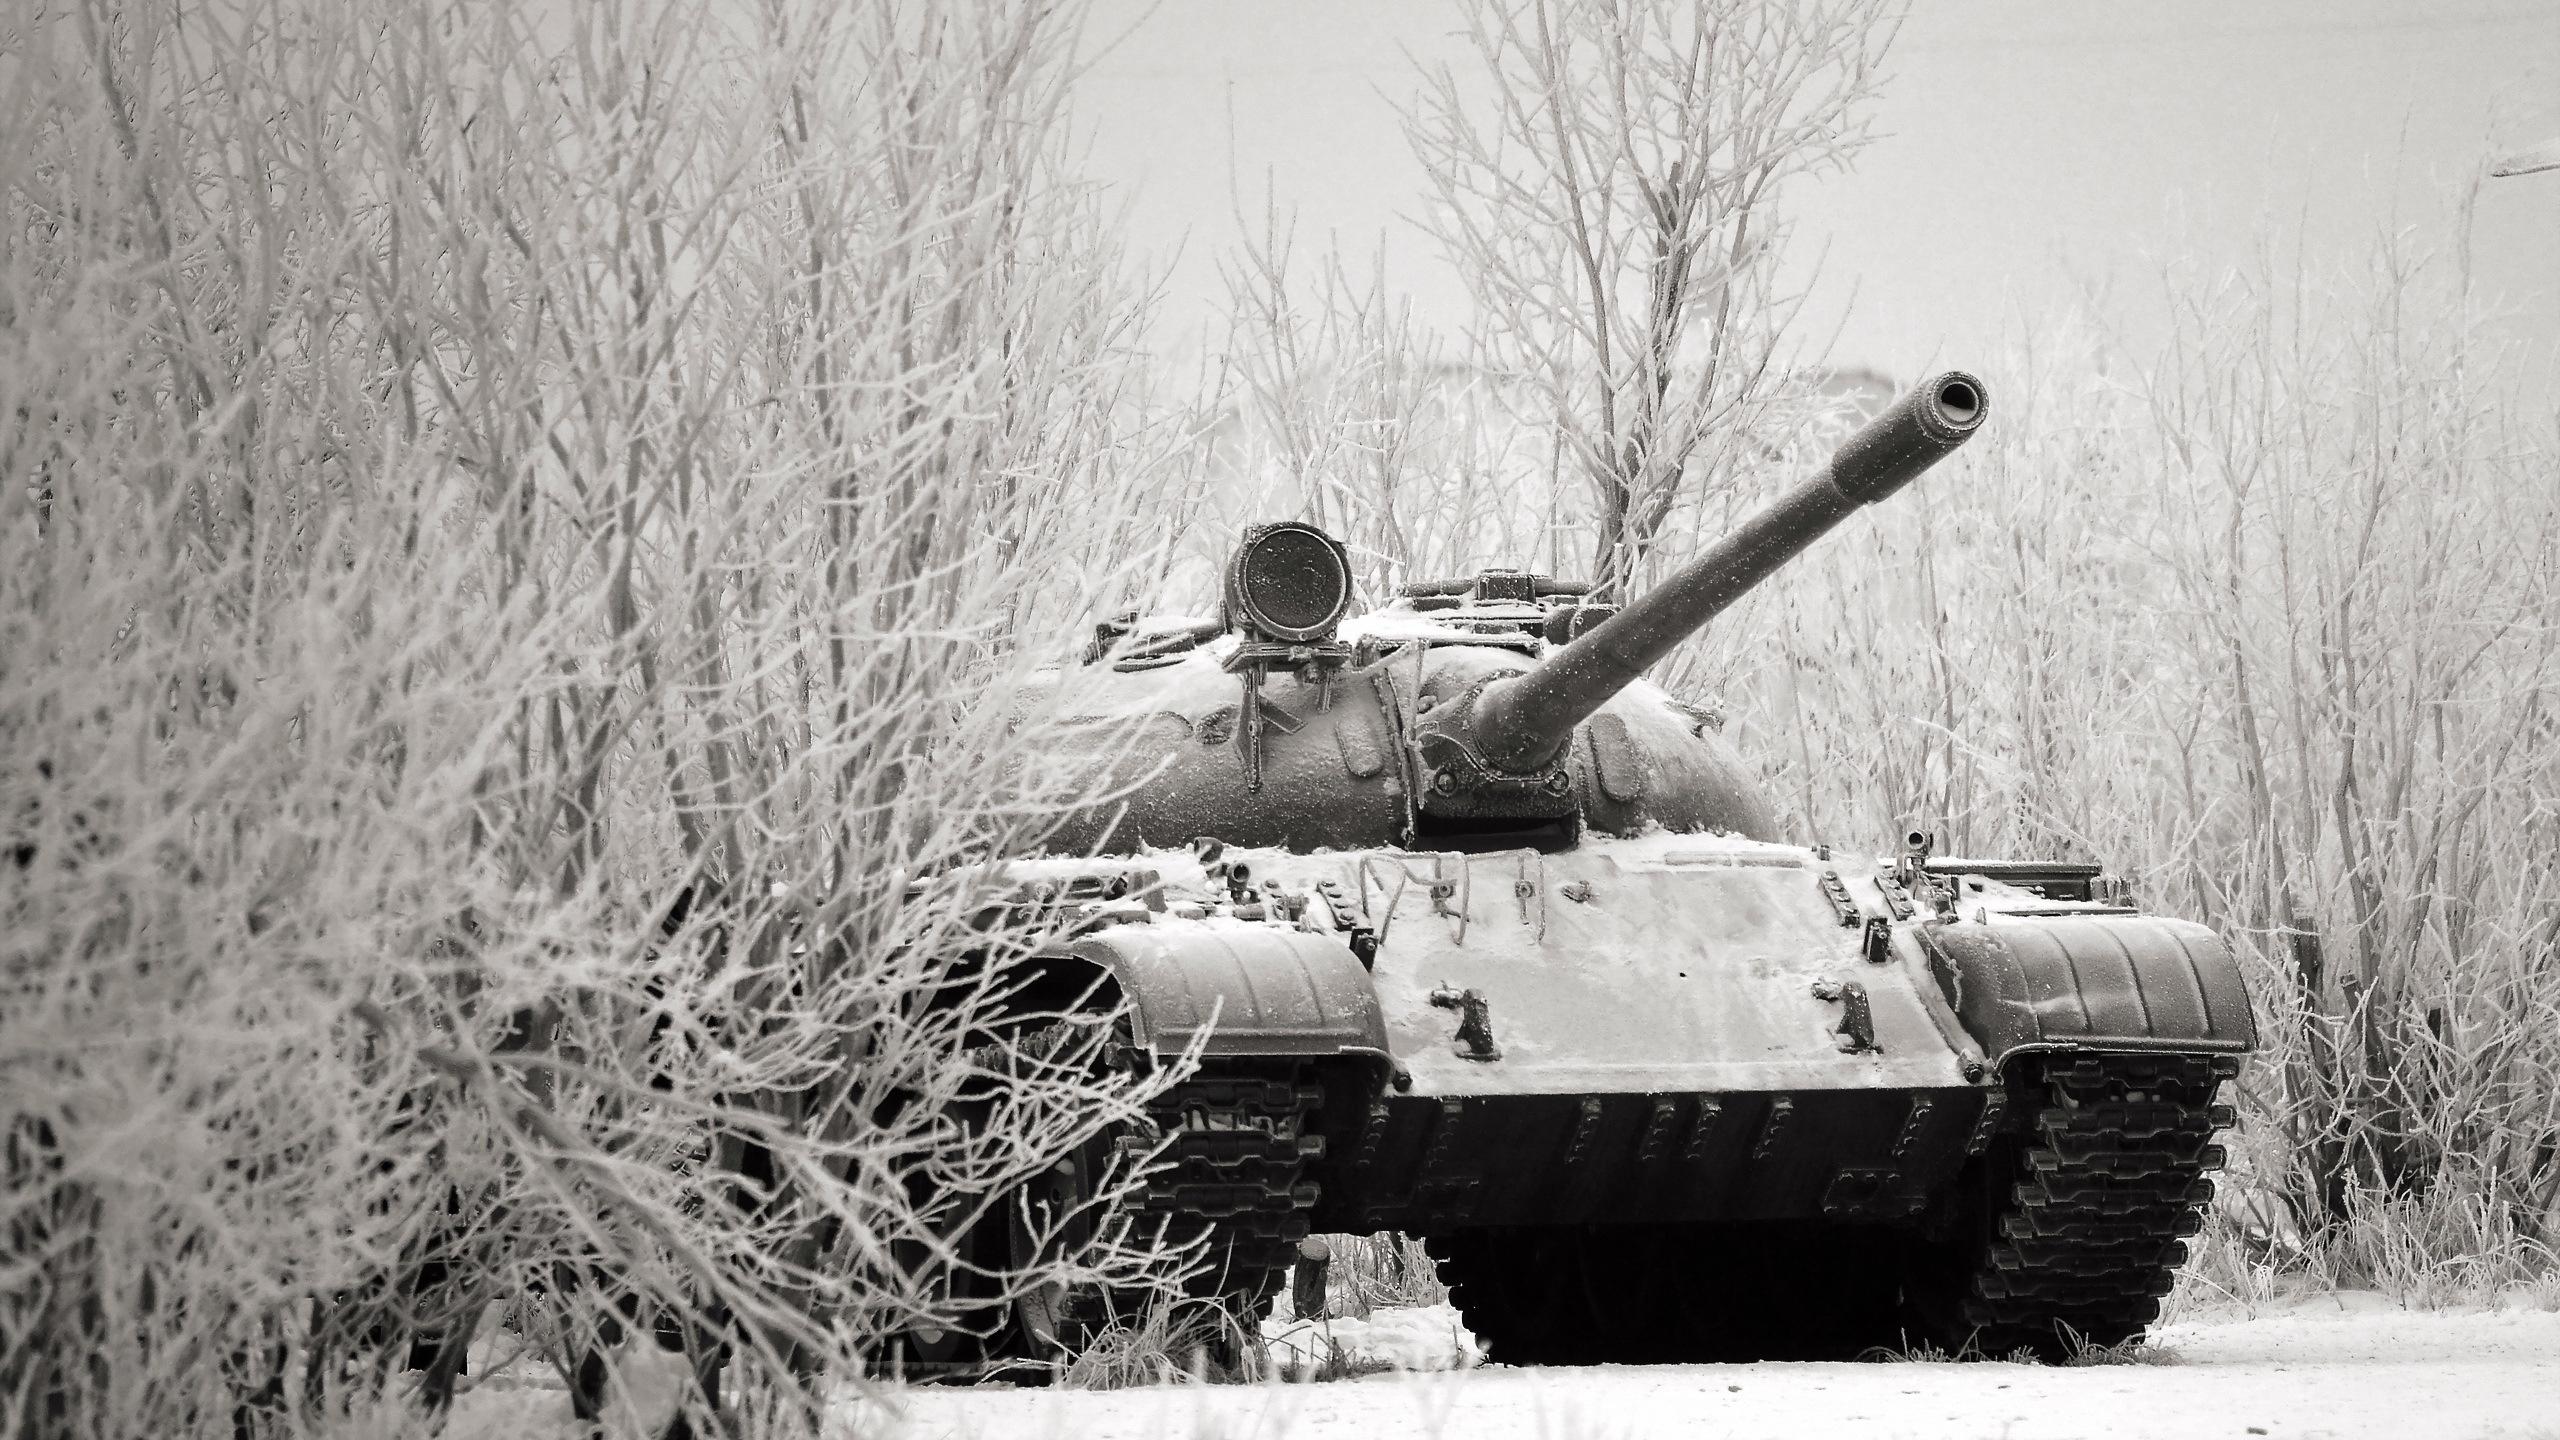 готовится танки зимой картинки волгограде все